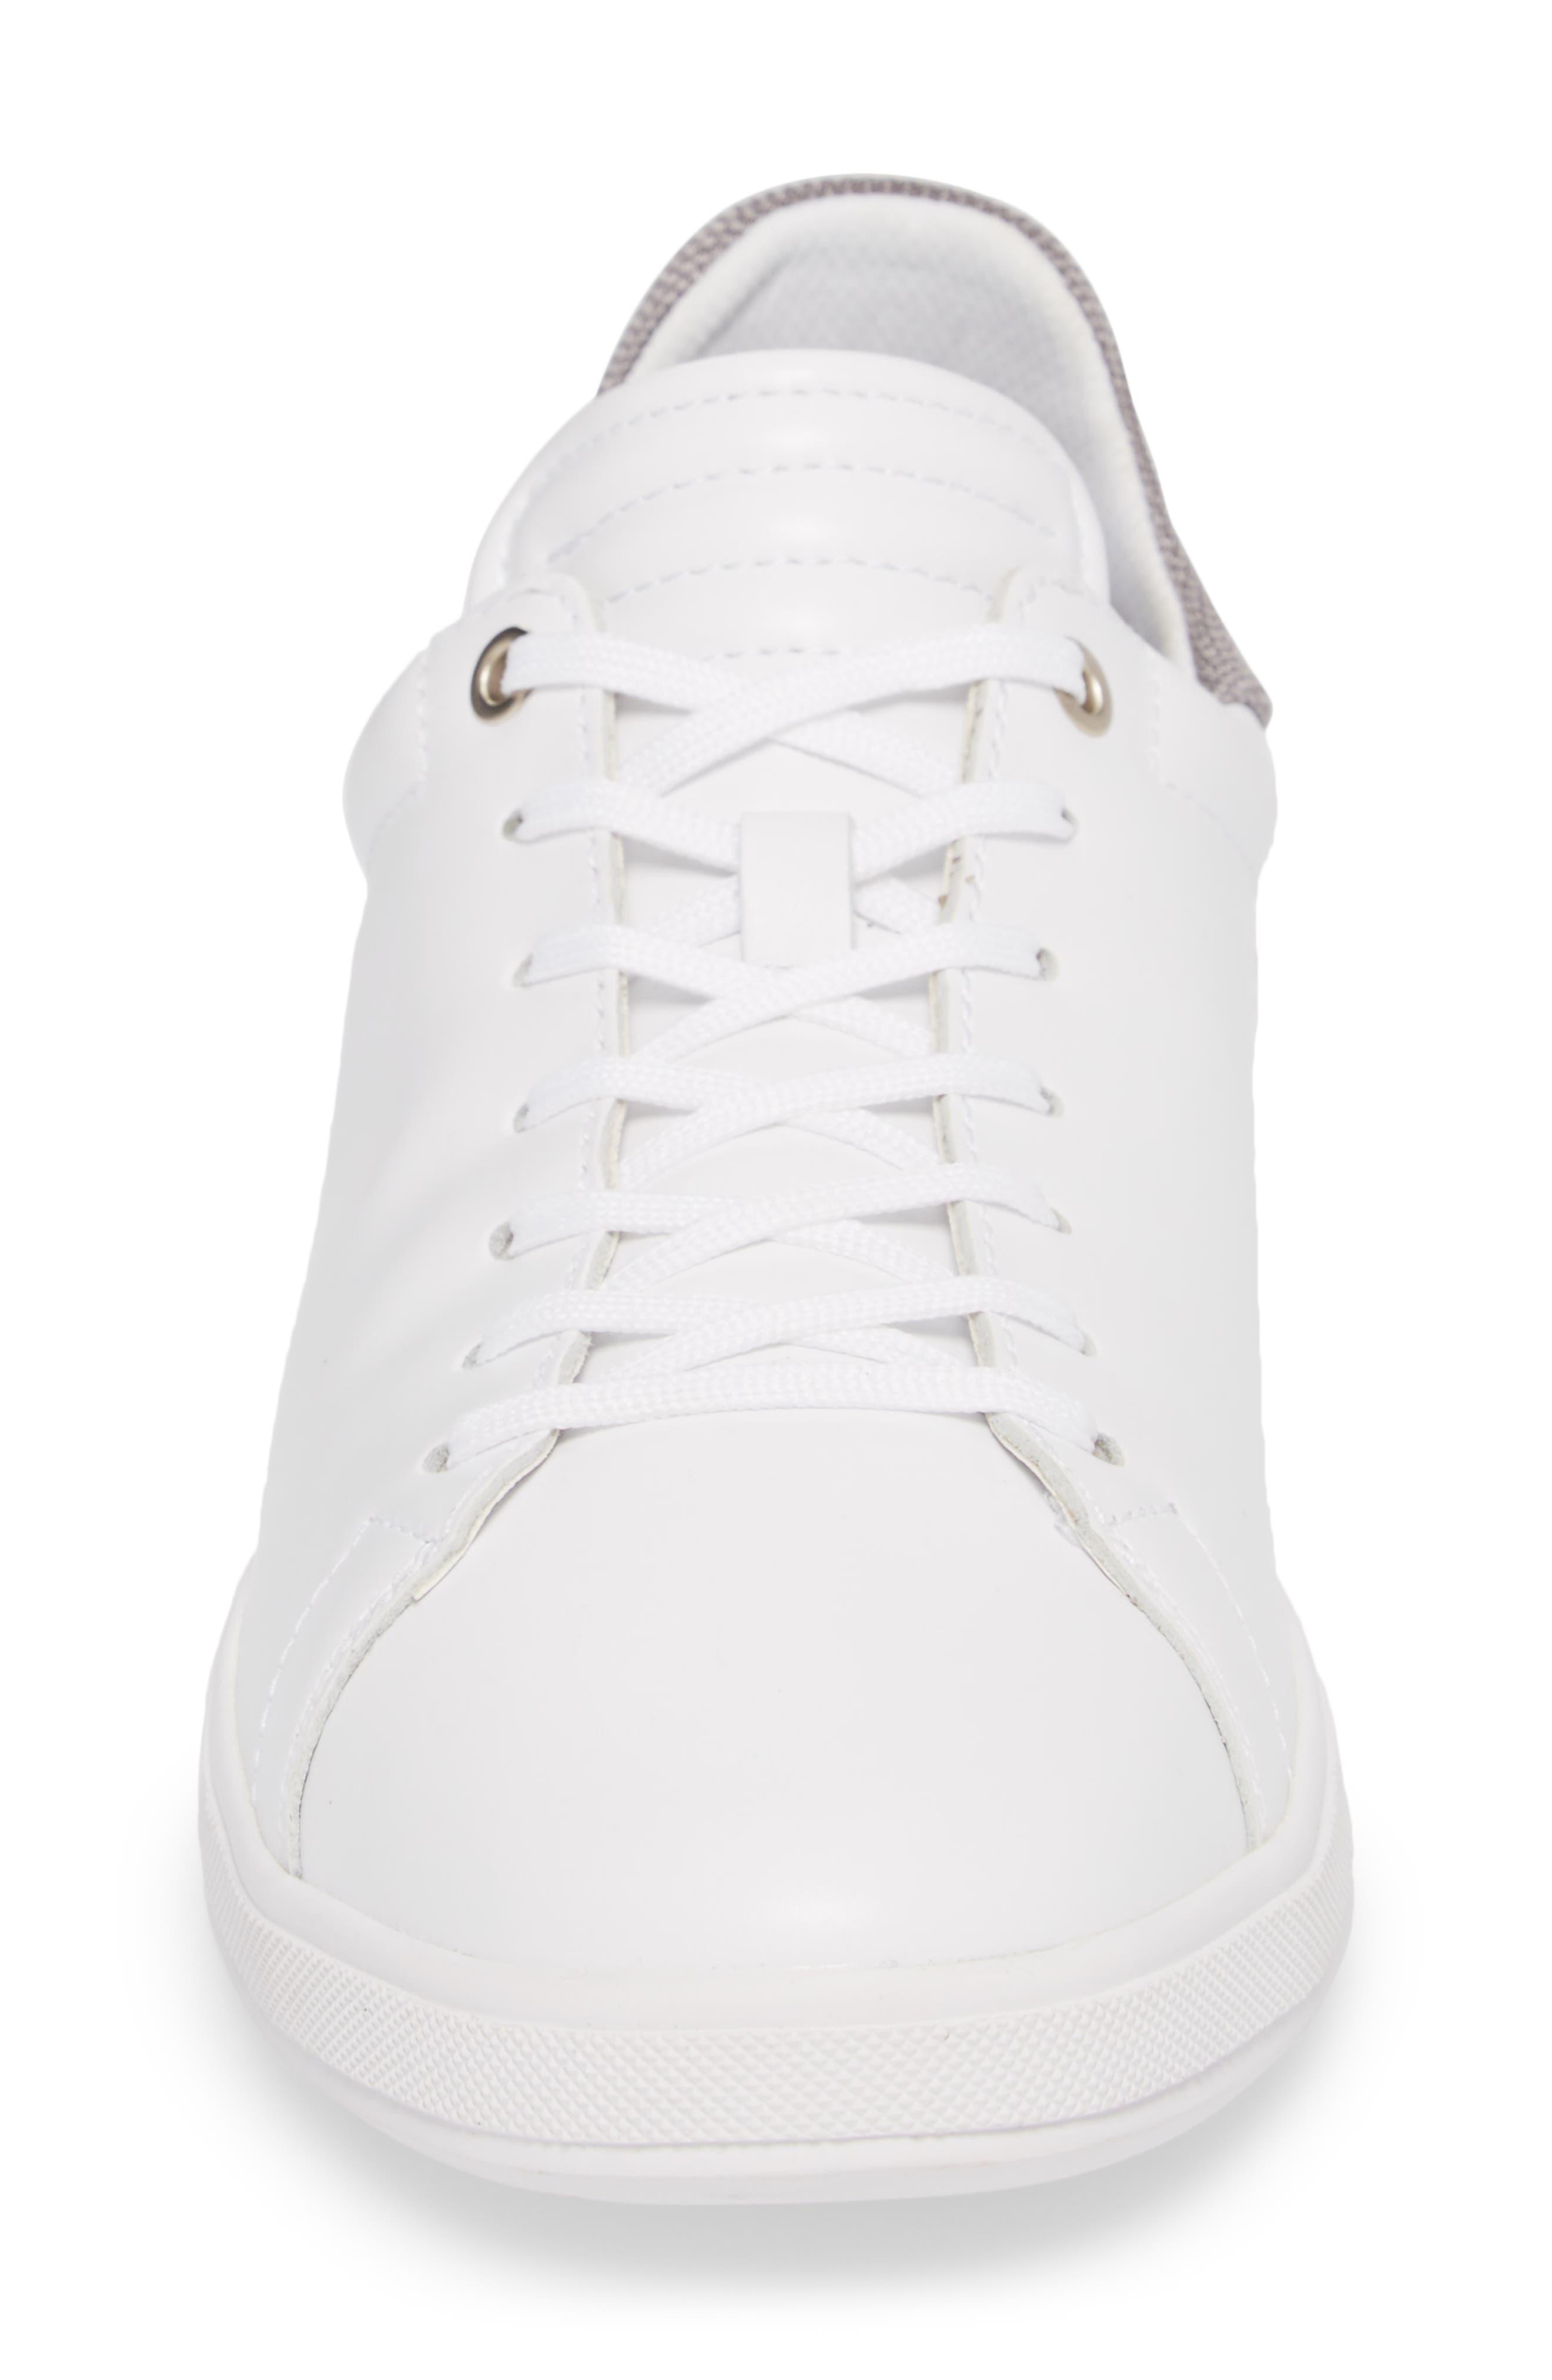 Joe Mama Sneaker,                             Alternate thumbnail 4, color,                             WHITE LEATHER